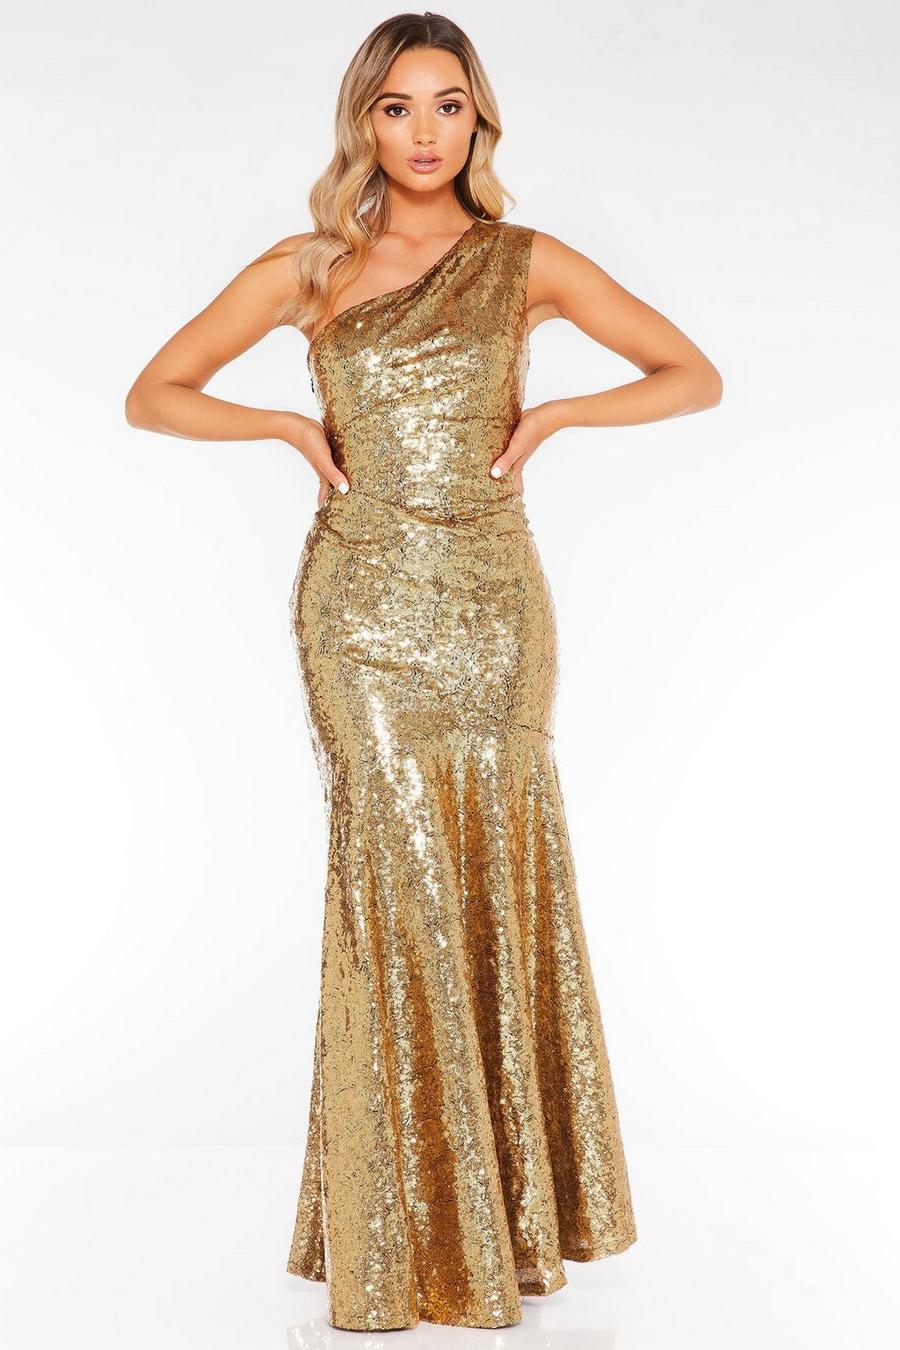 b69cc7197b56d Gold Sequin One Shoulder Fishtail Maxi Dress